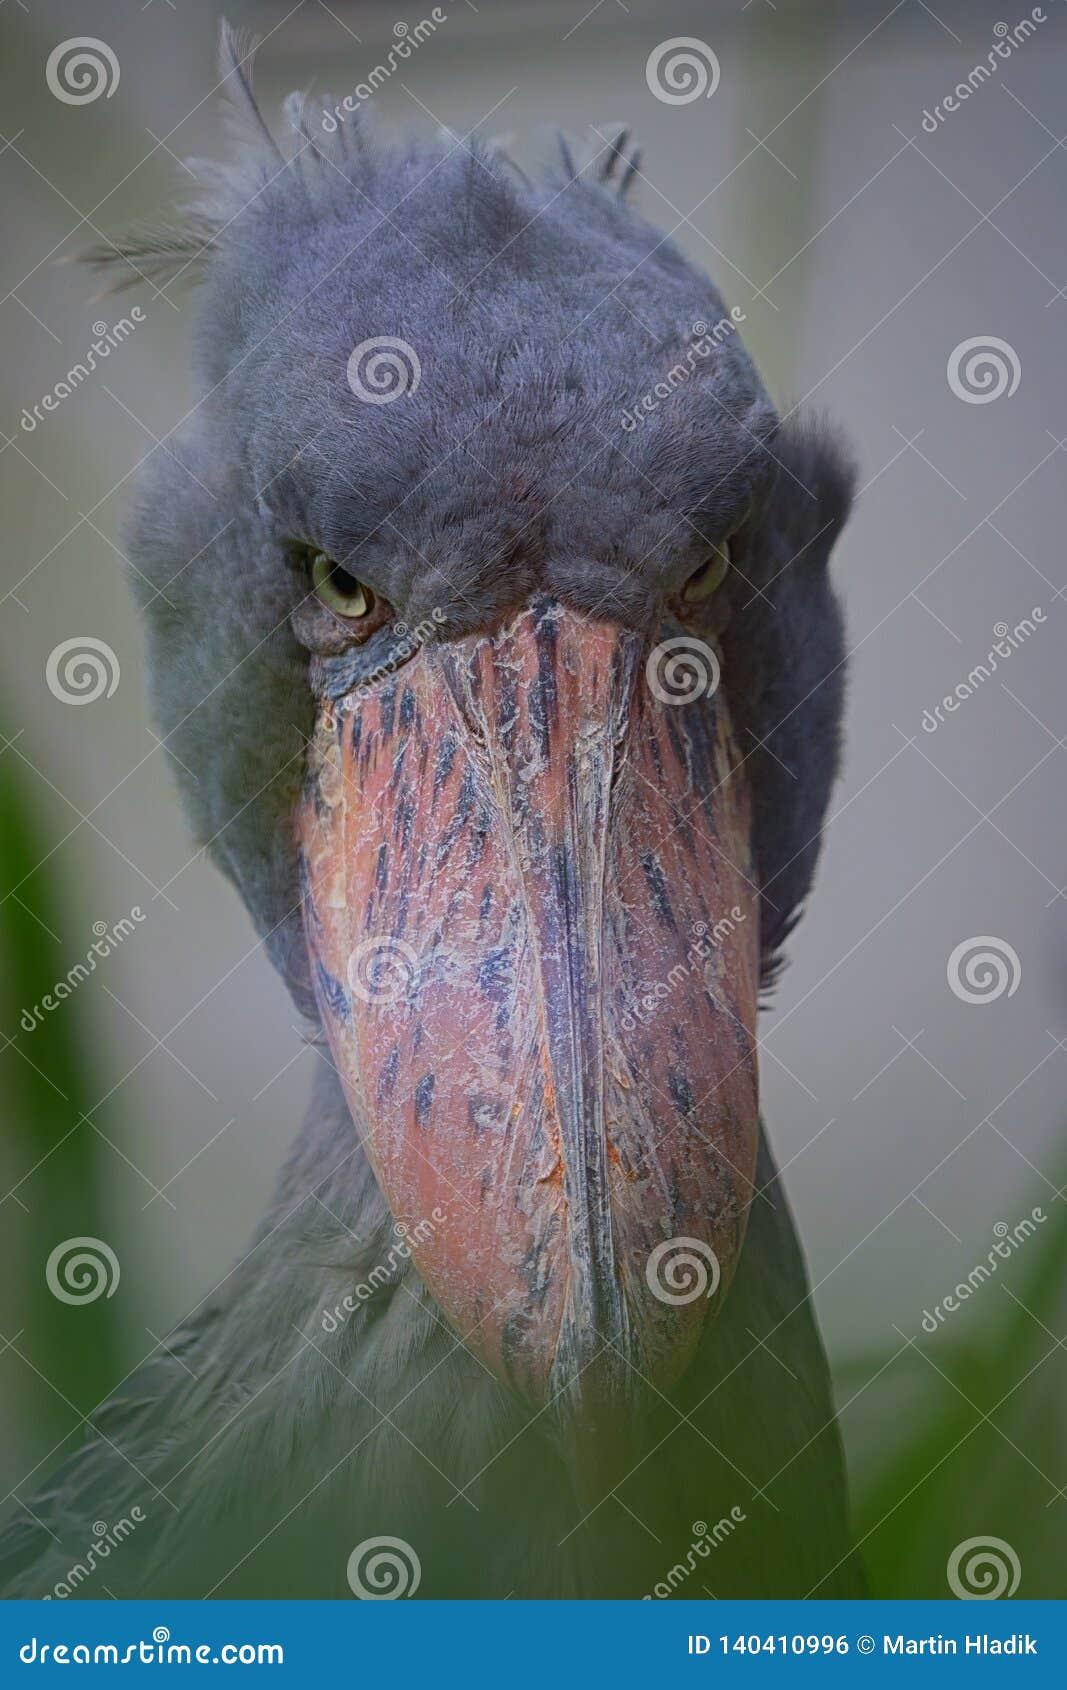 Shoebill, bird, portrait, eye, headbird